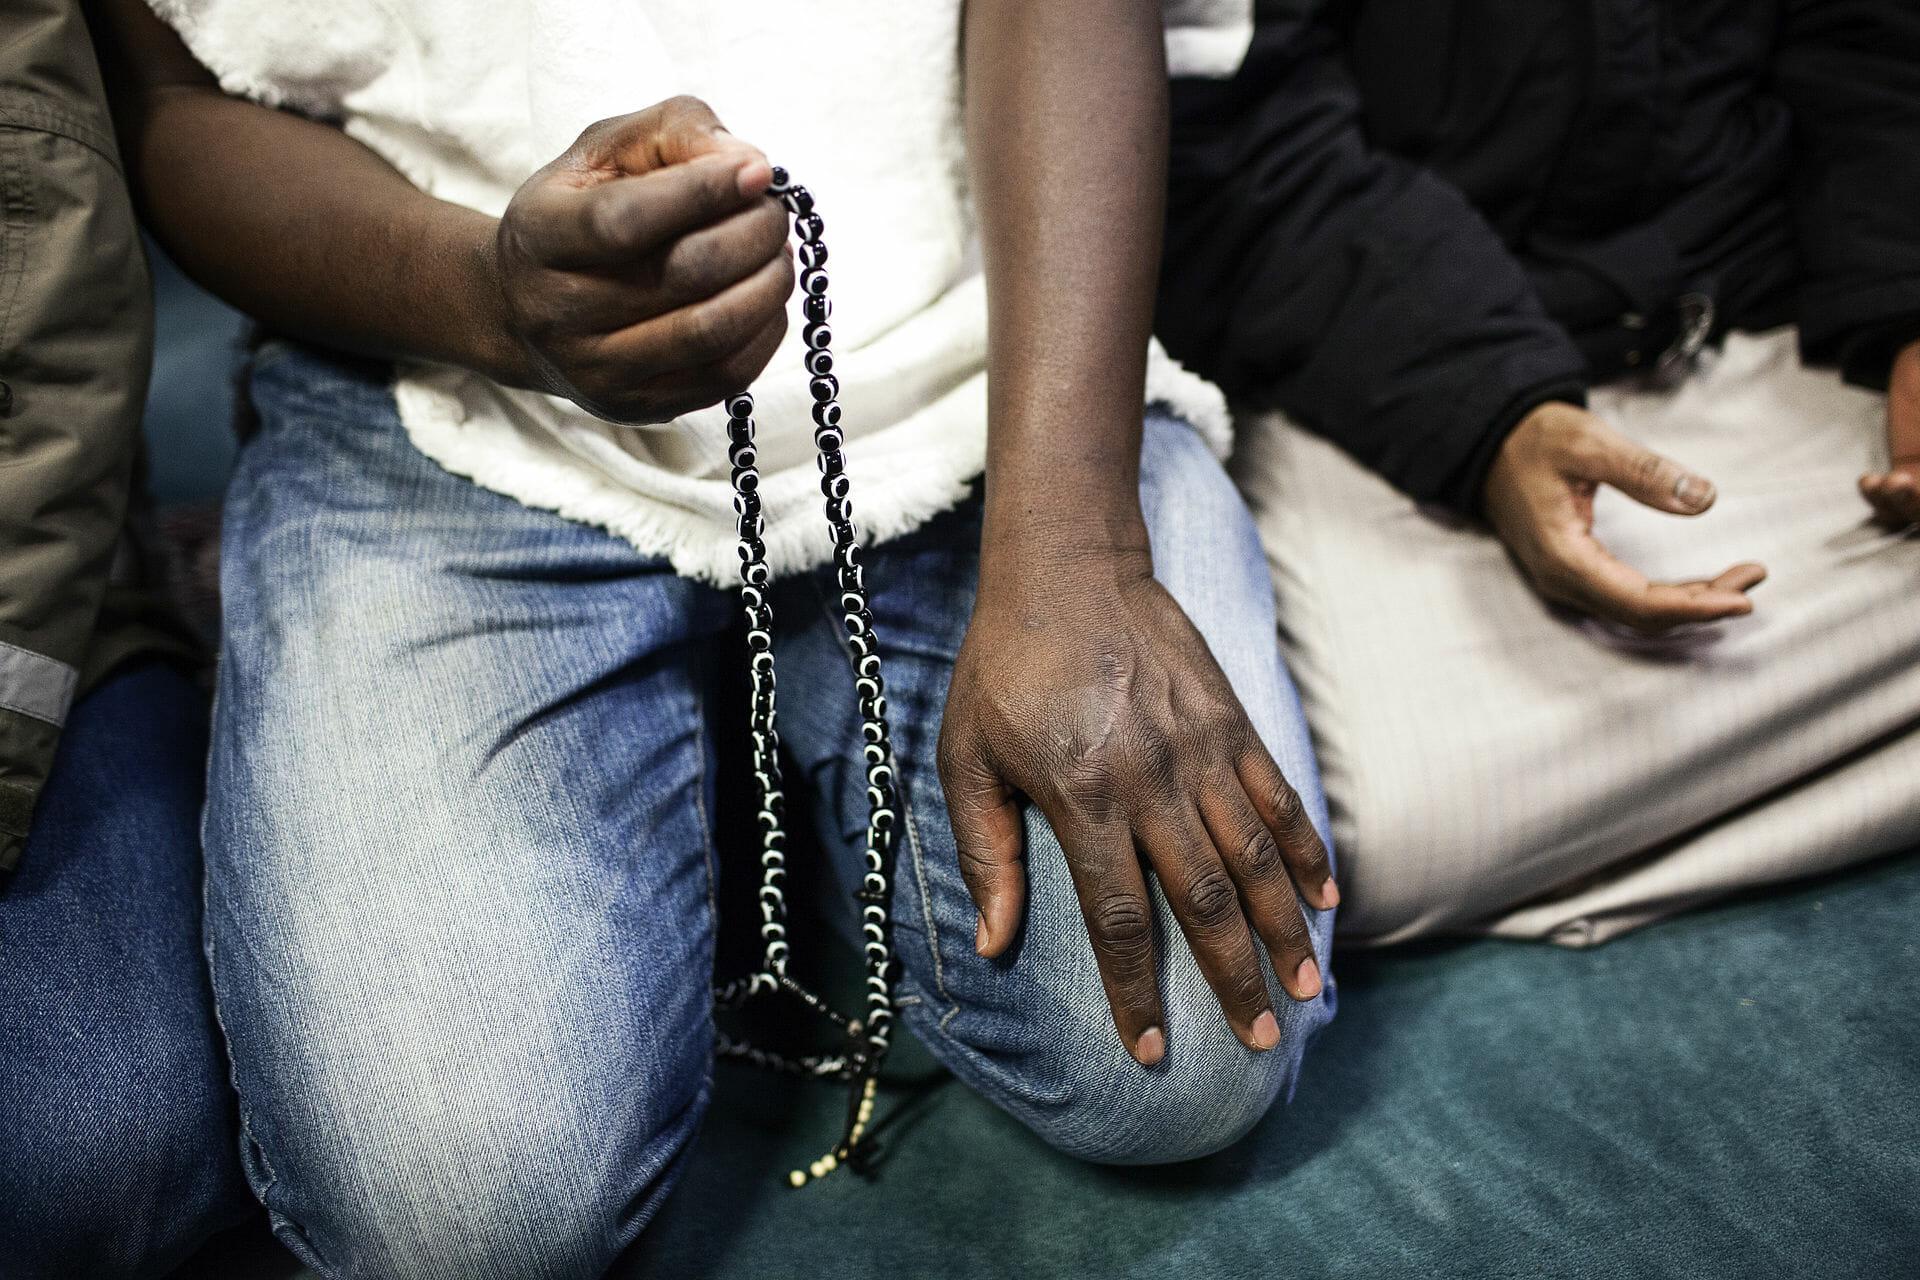 Read more about the article FAKTA: Den muslimske bøn